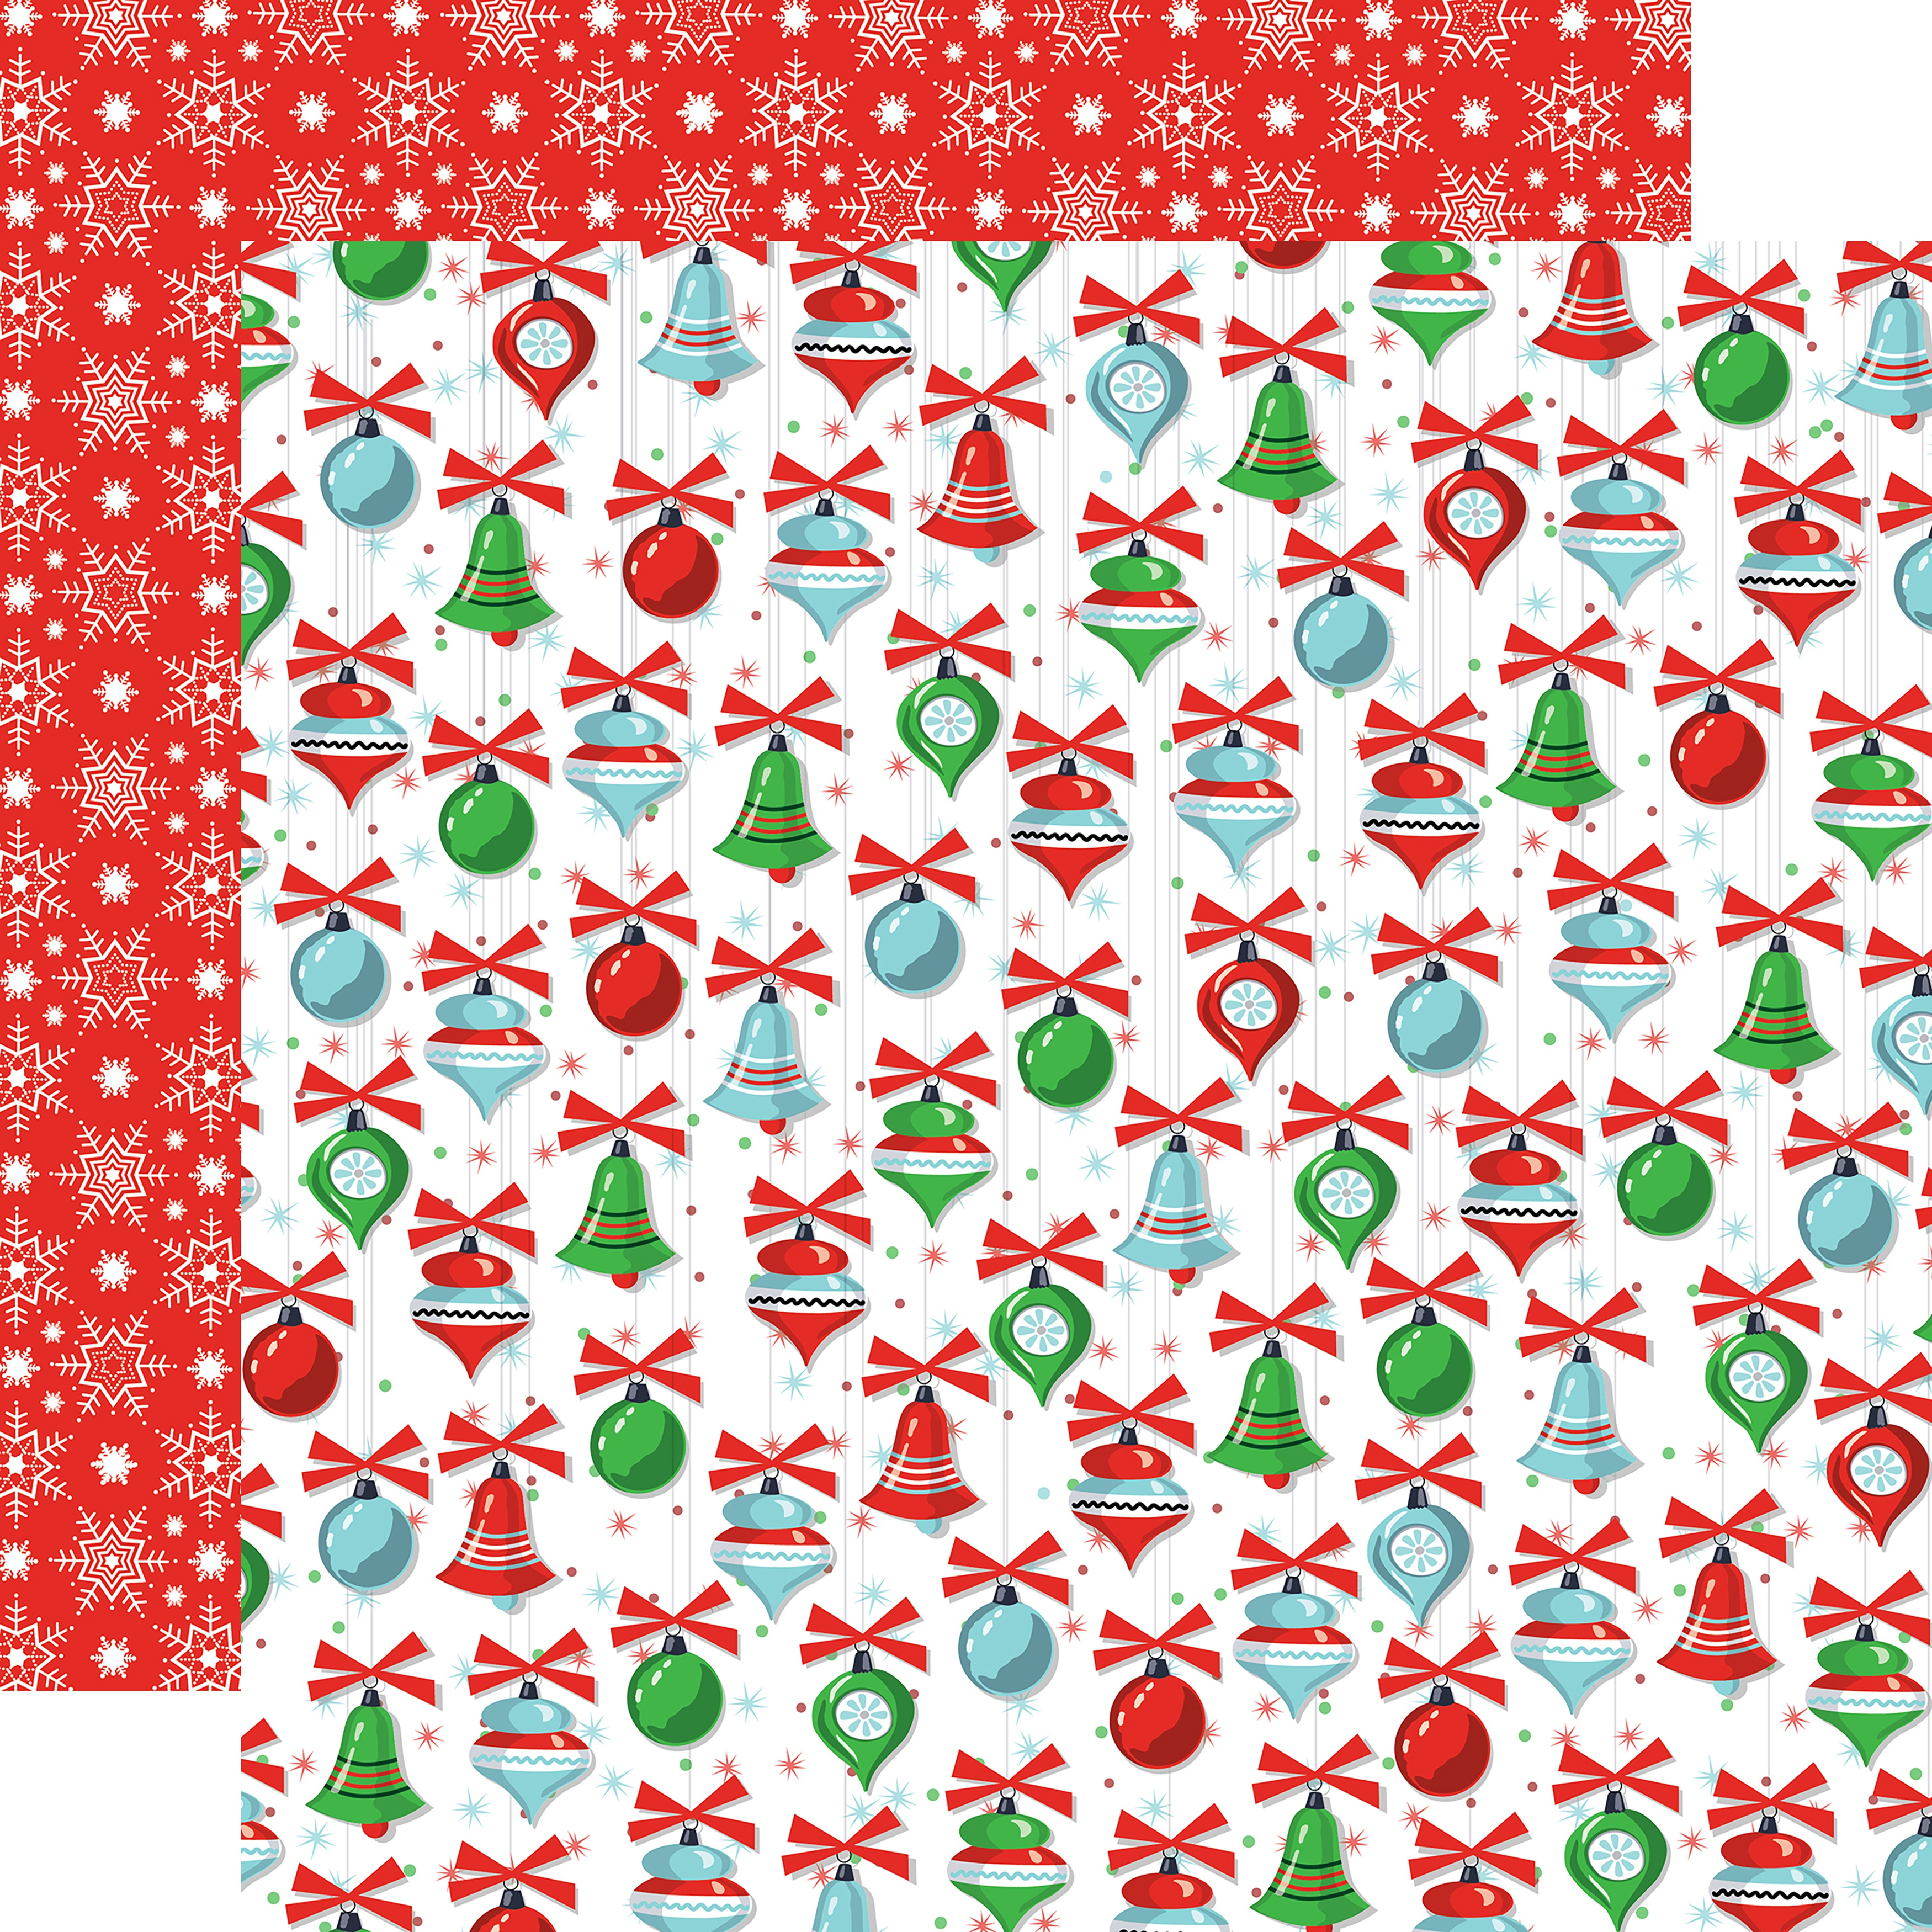 PPR - SANTA'S WORKSHOP CHRISTMAS TRIMMINGS